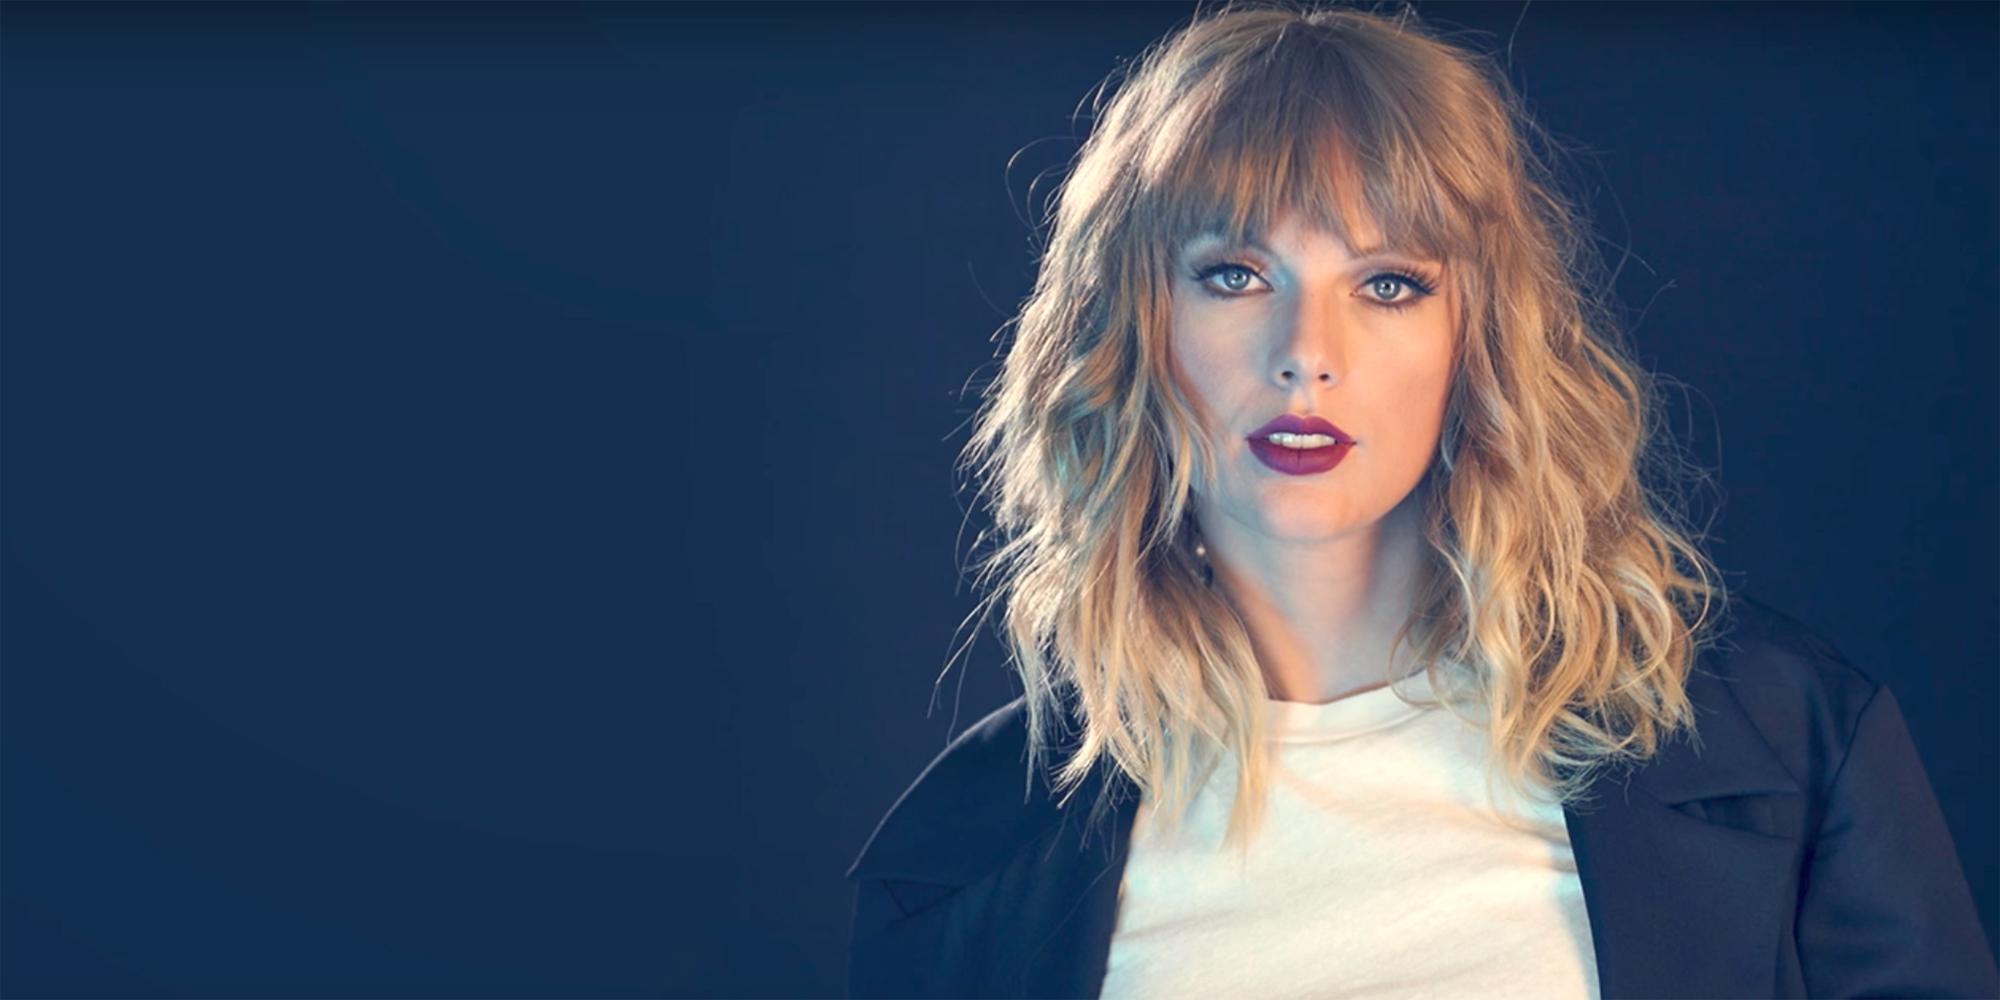 Fuck Taylor Swift nude photos 2019